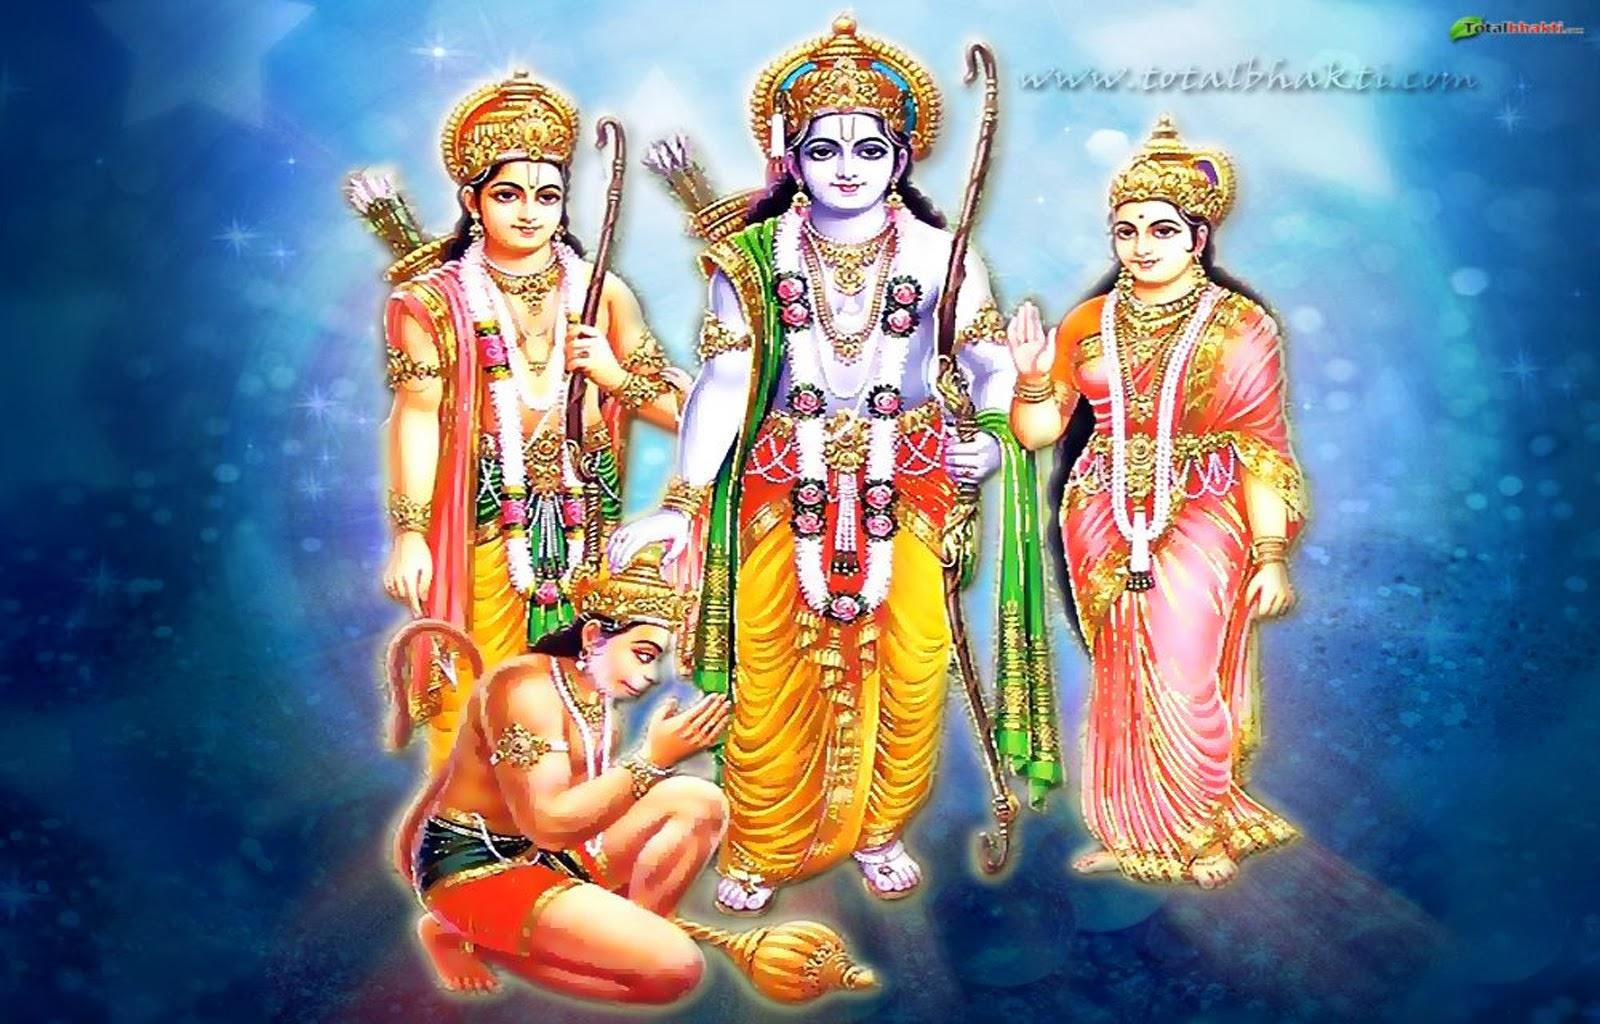 Wallpaper download bhakti - Color Download Wallpaper Spiritual Totalbhakti Preview